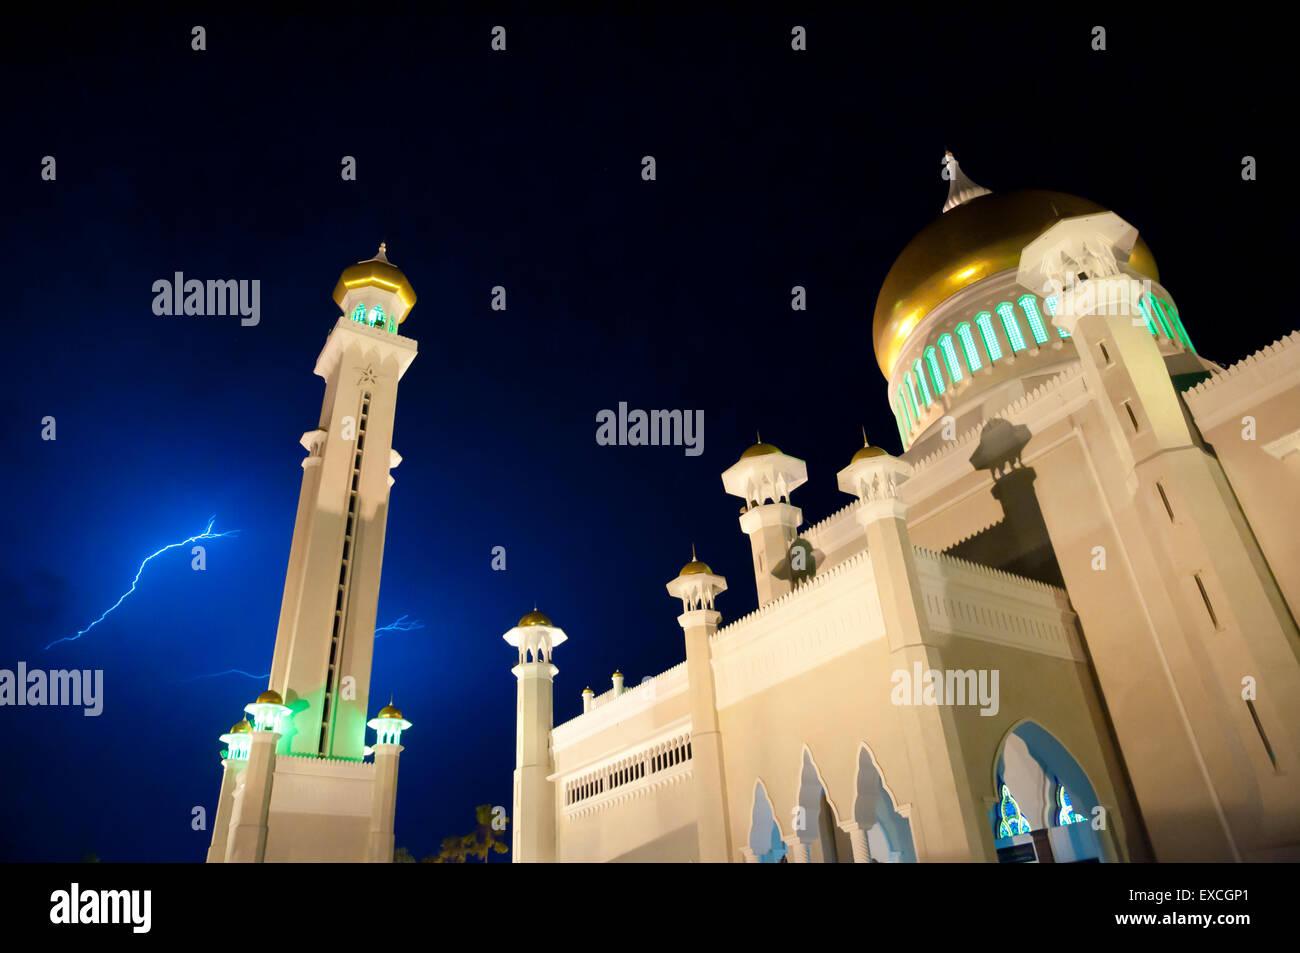 Sultan Omar Ali Saifuddin Mosque - Bandar Seri Begawan - Brunei - Stock Image